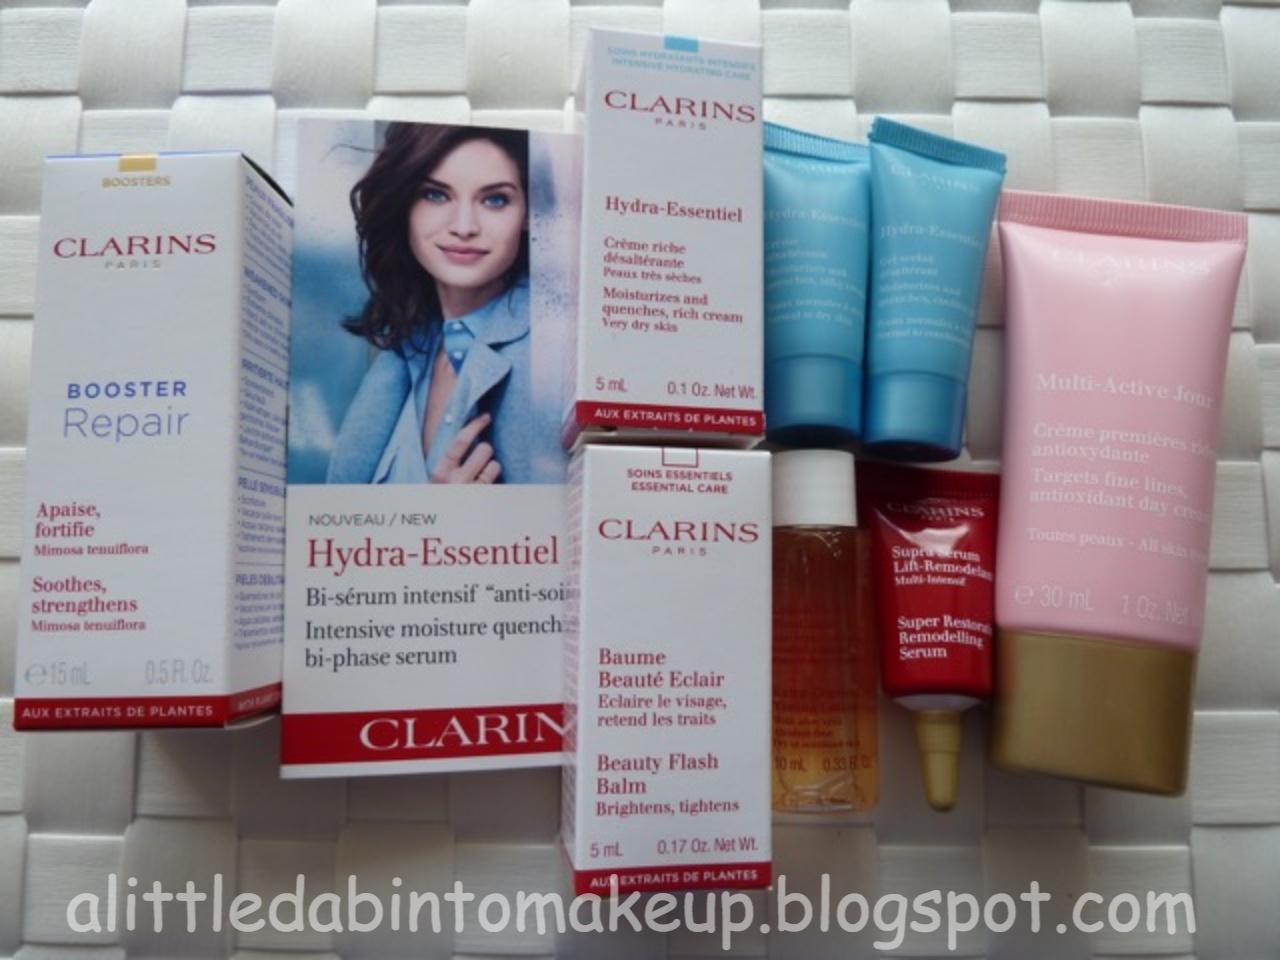 Hydra-Essentiel Rich Cream - Very Dry Skin by Clarins #3